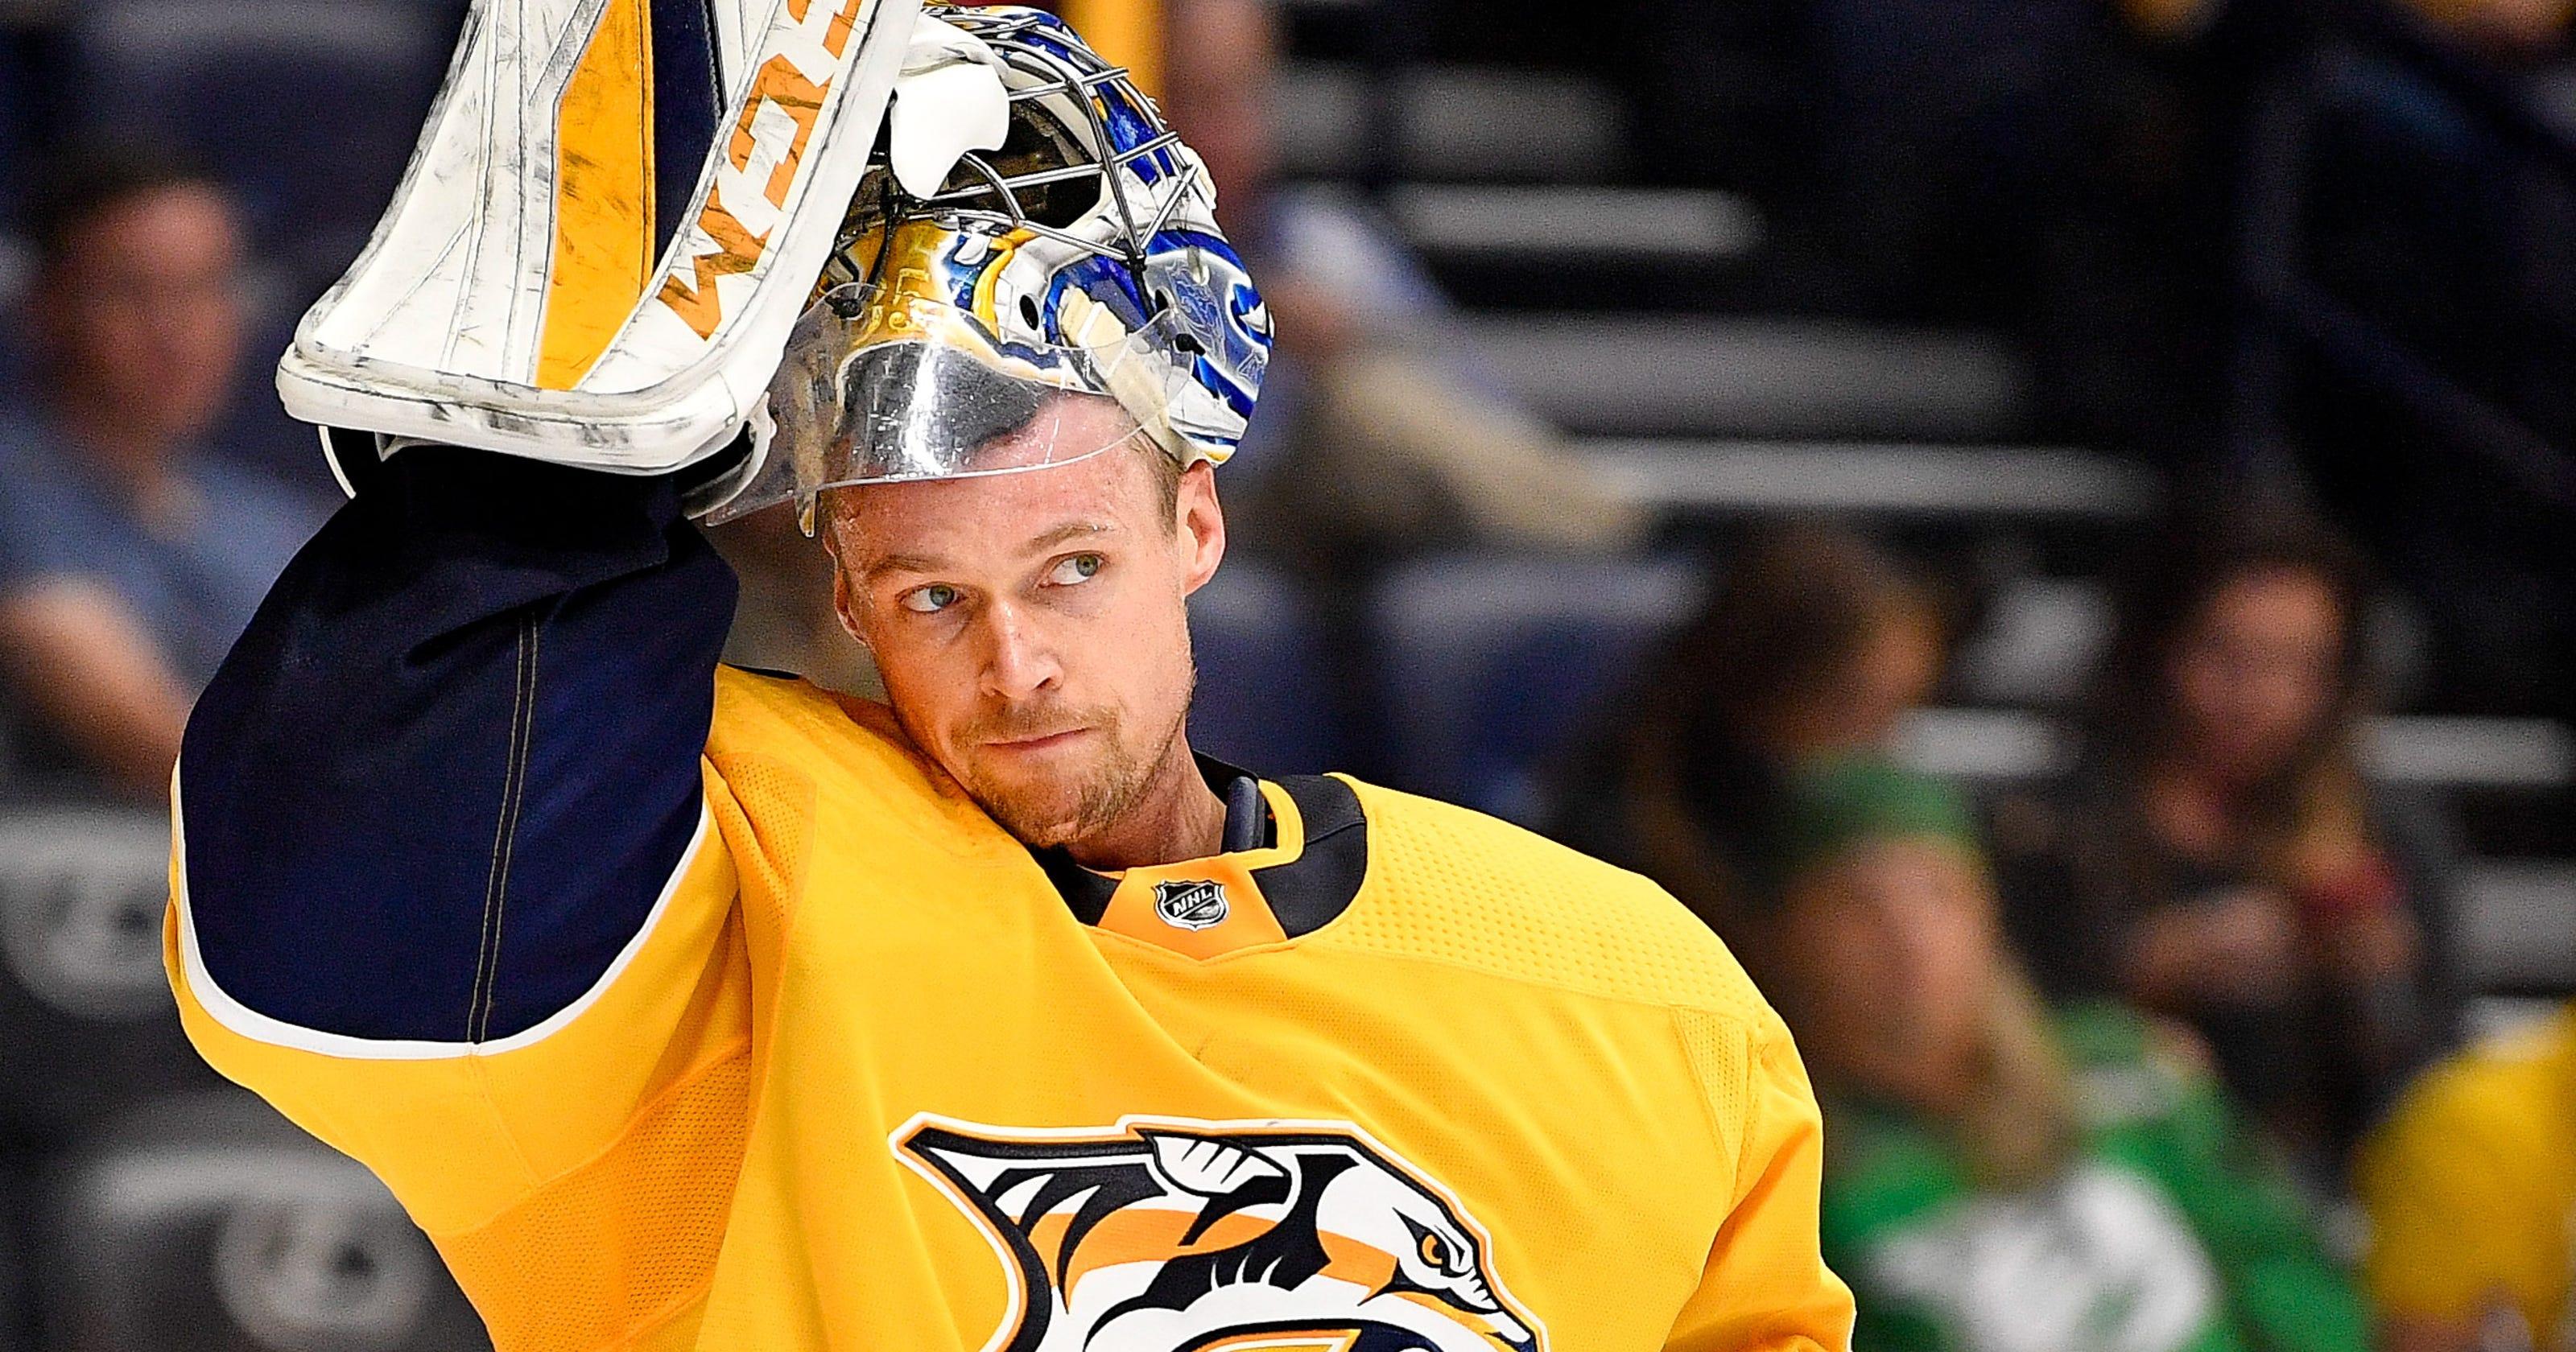 Predators  Pekka Rinne has shrinking window to win in Nashville 25e04319490